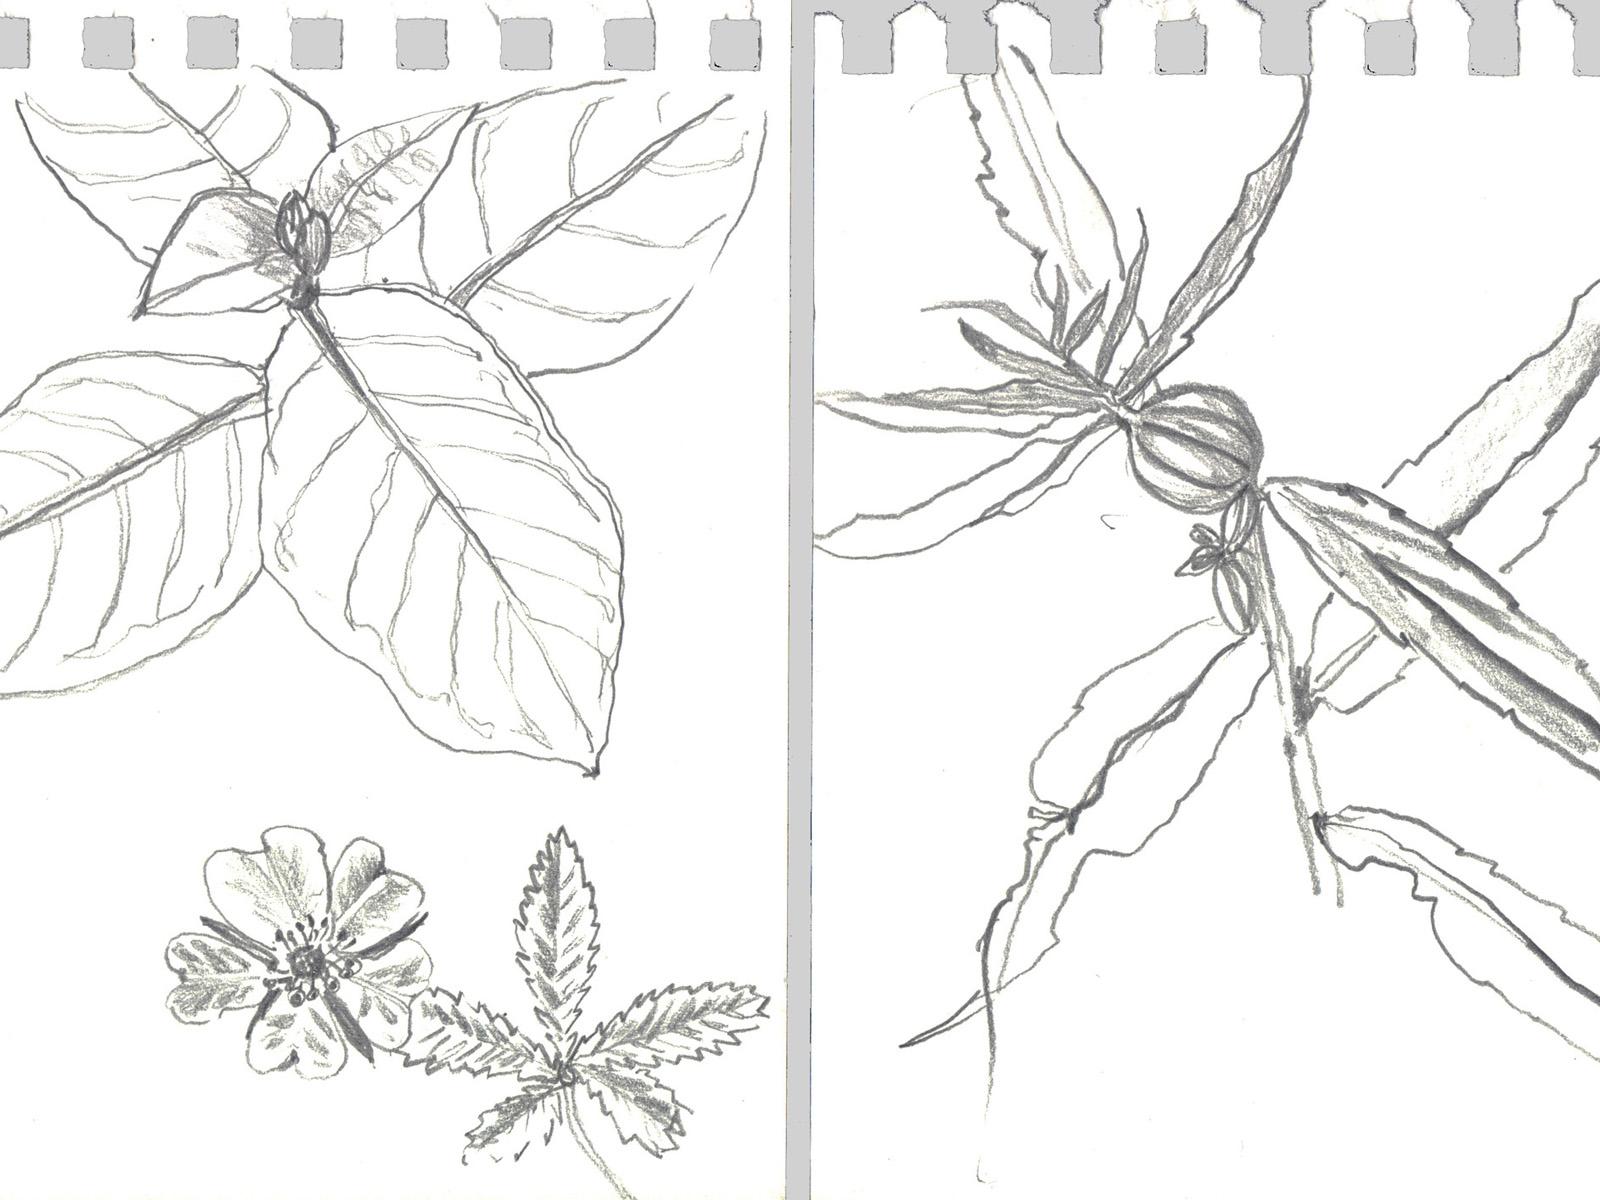 LoP-aten-riveredge-sketches.jpg